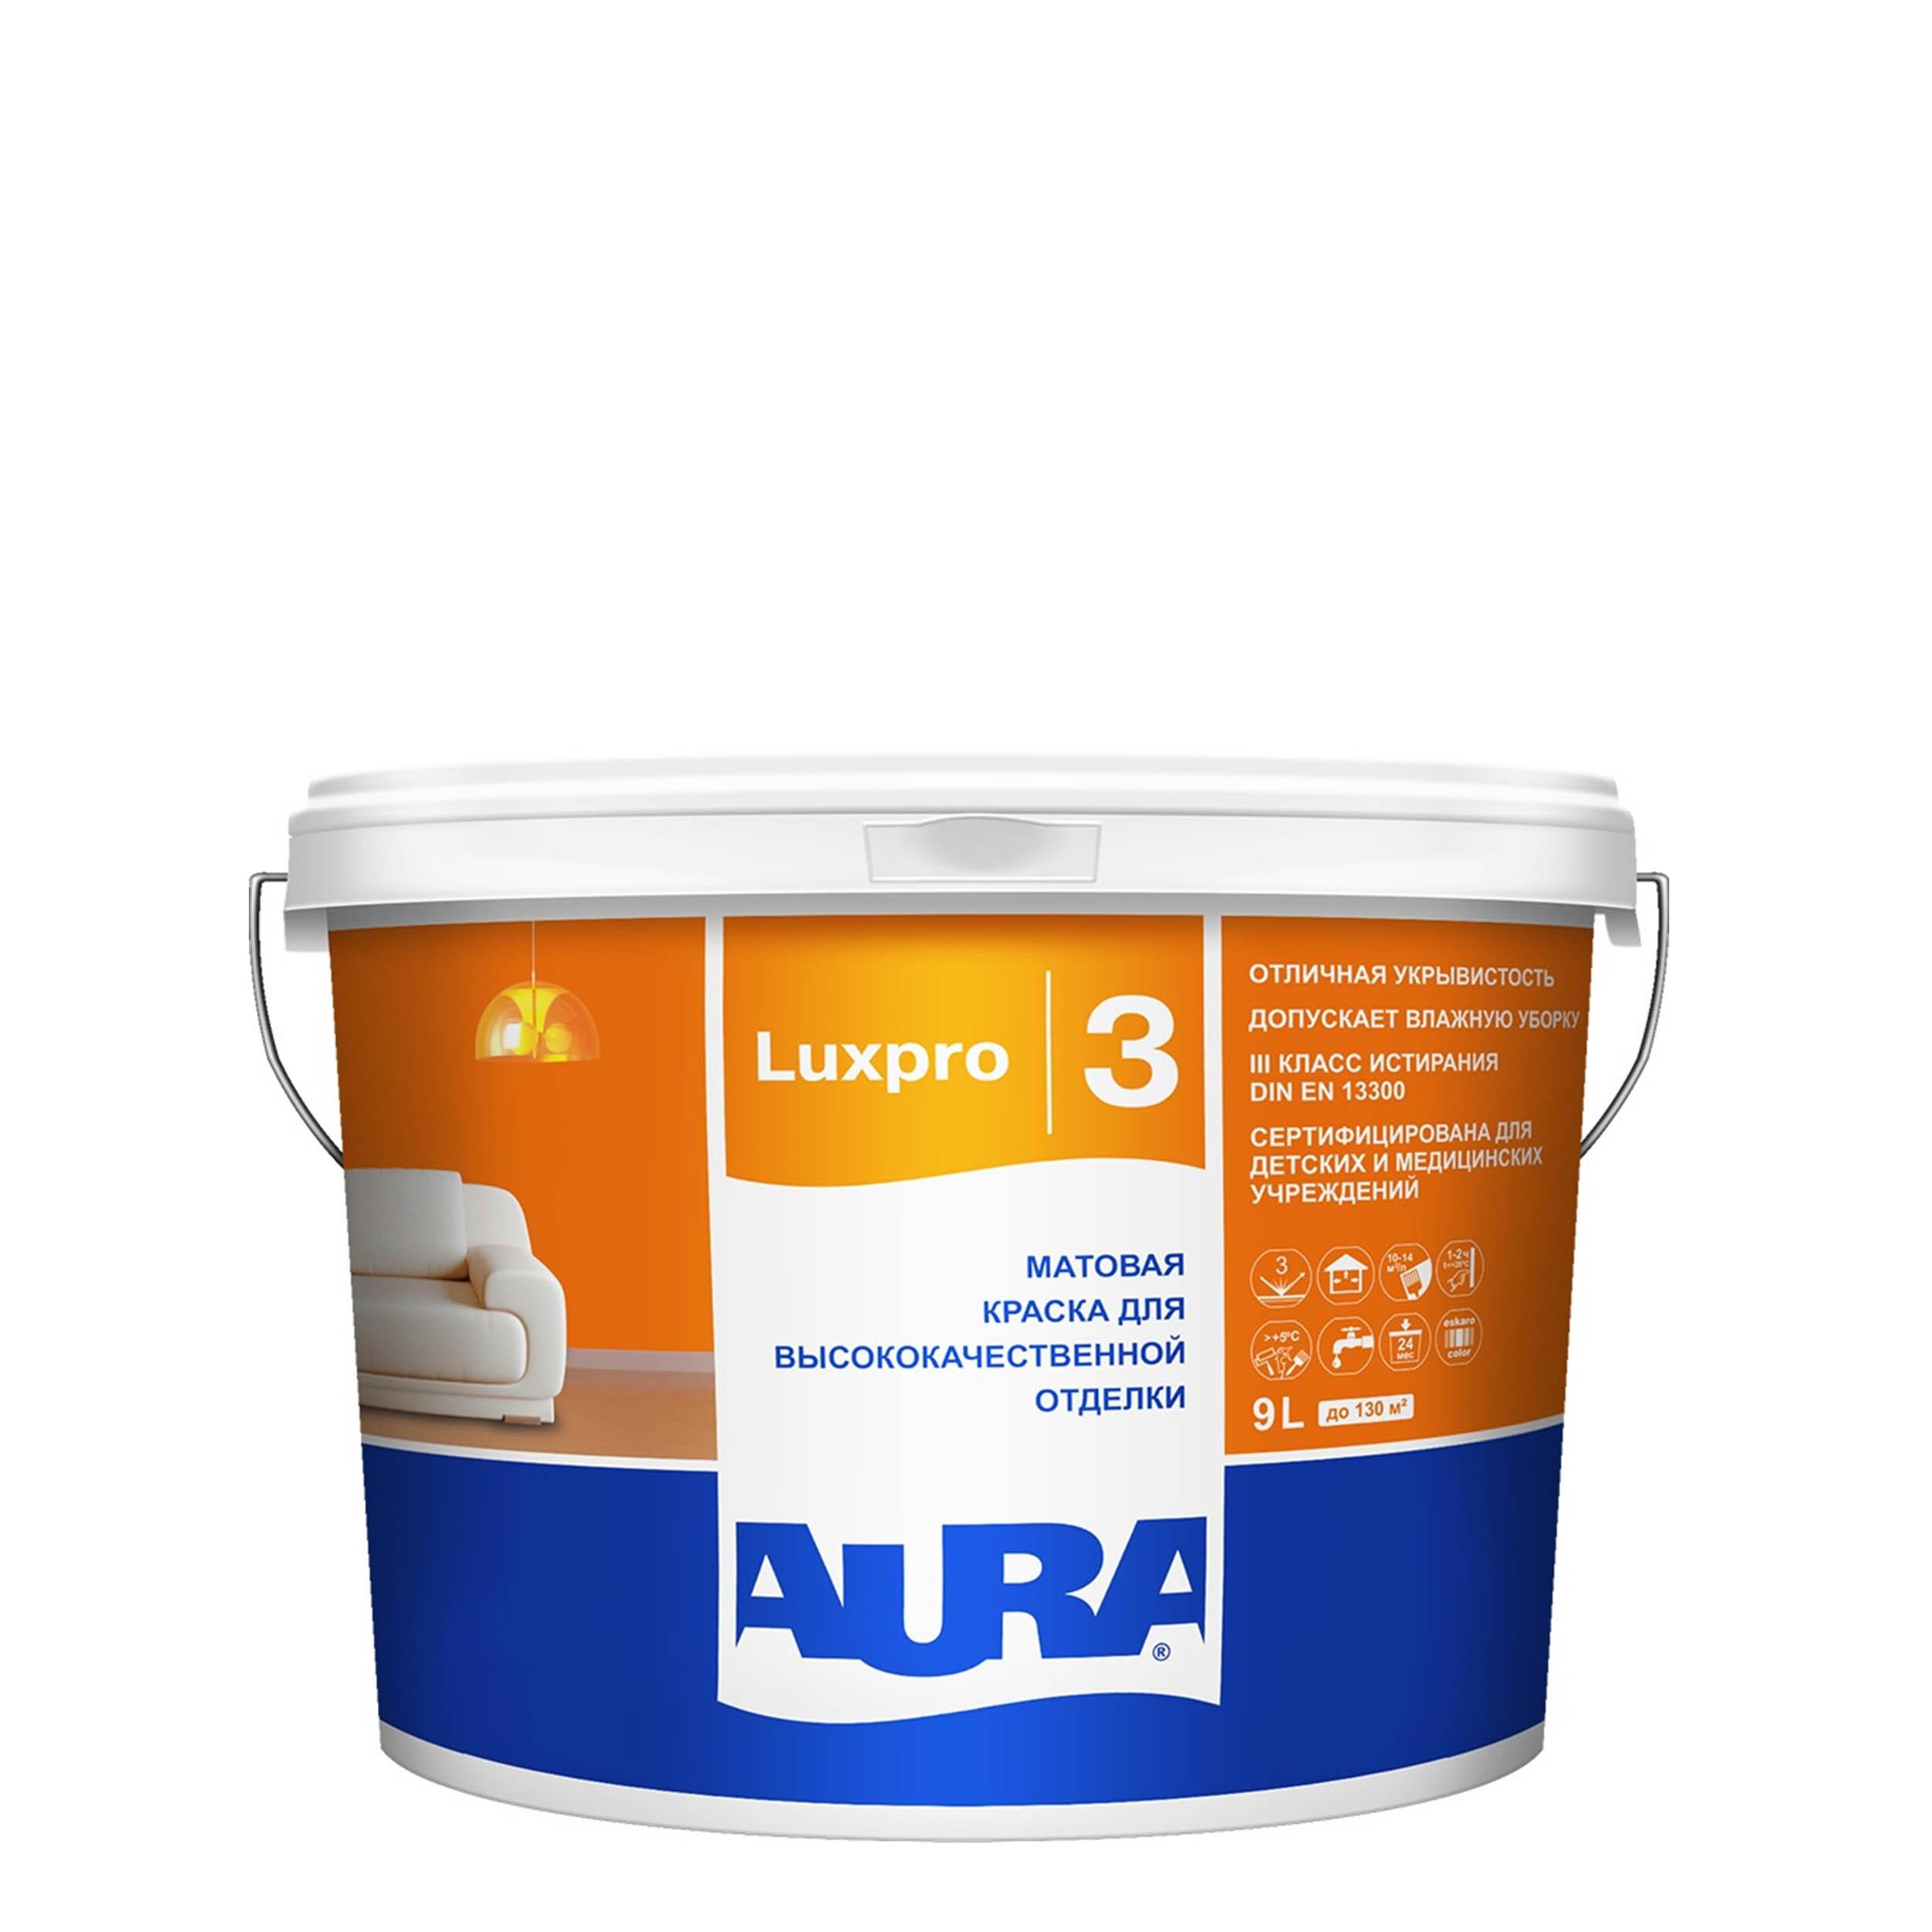 Фото 8 - Краска интерьерная, Aura LuxPRO 3, RAL 1007, 11 кг.